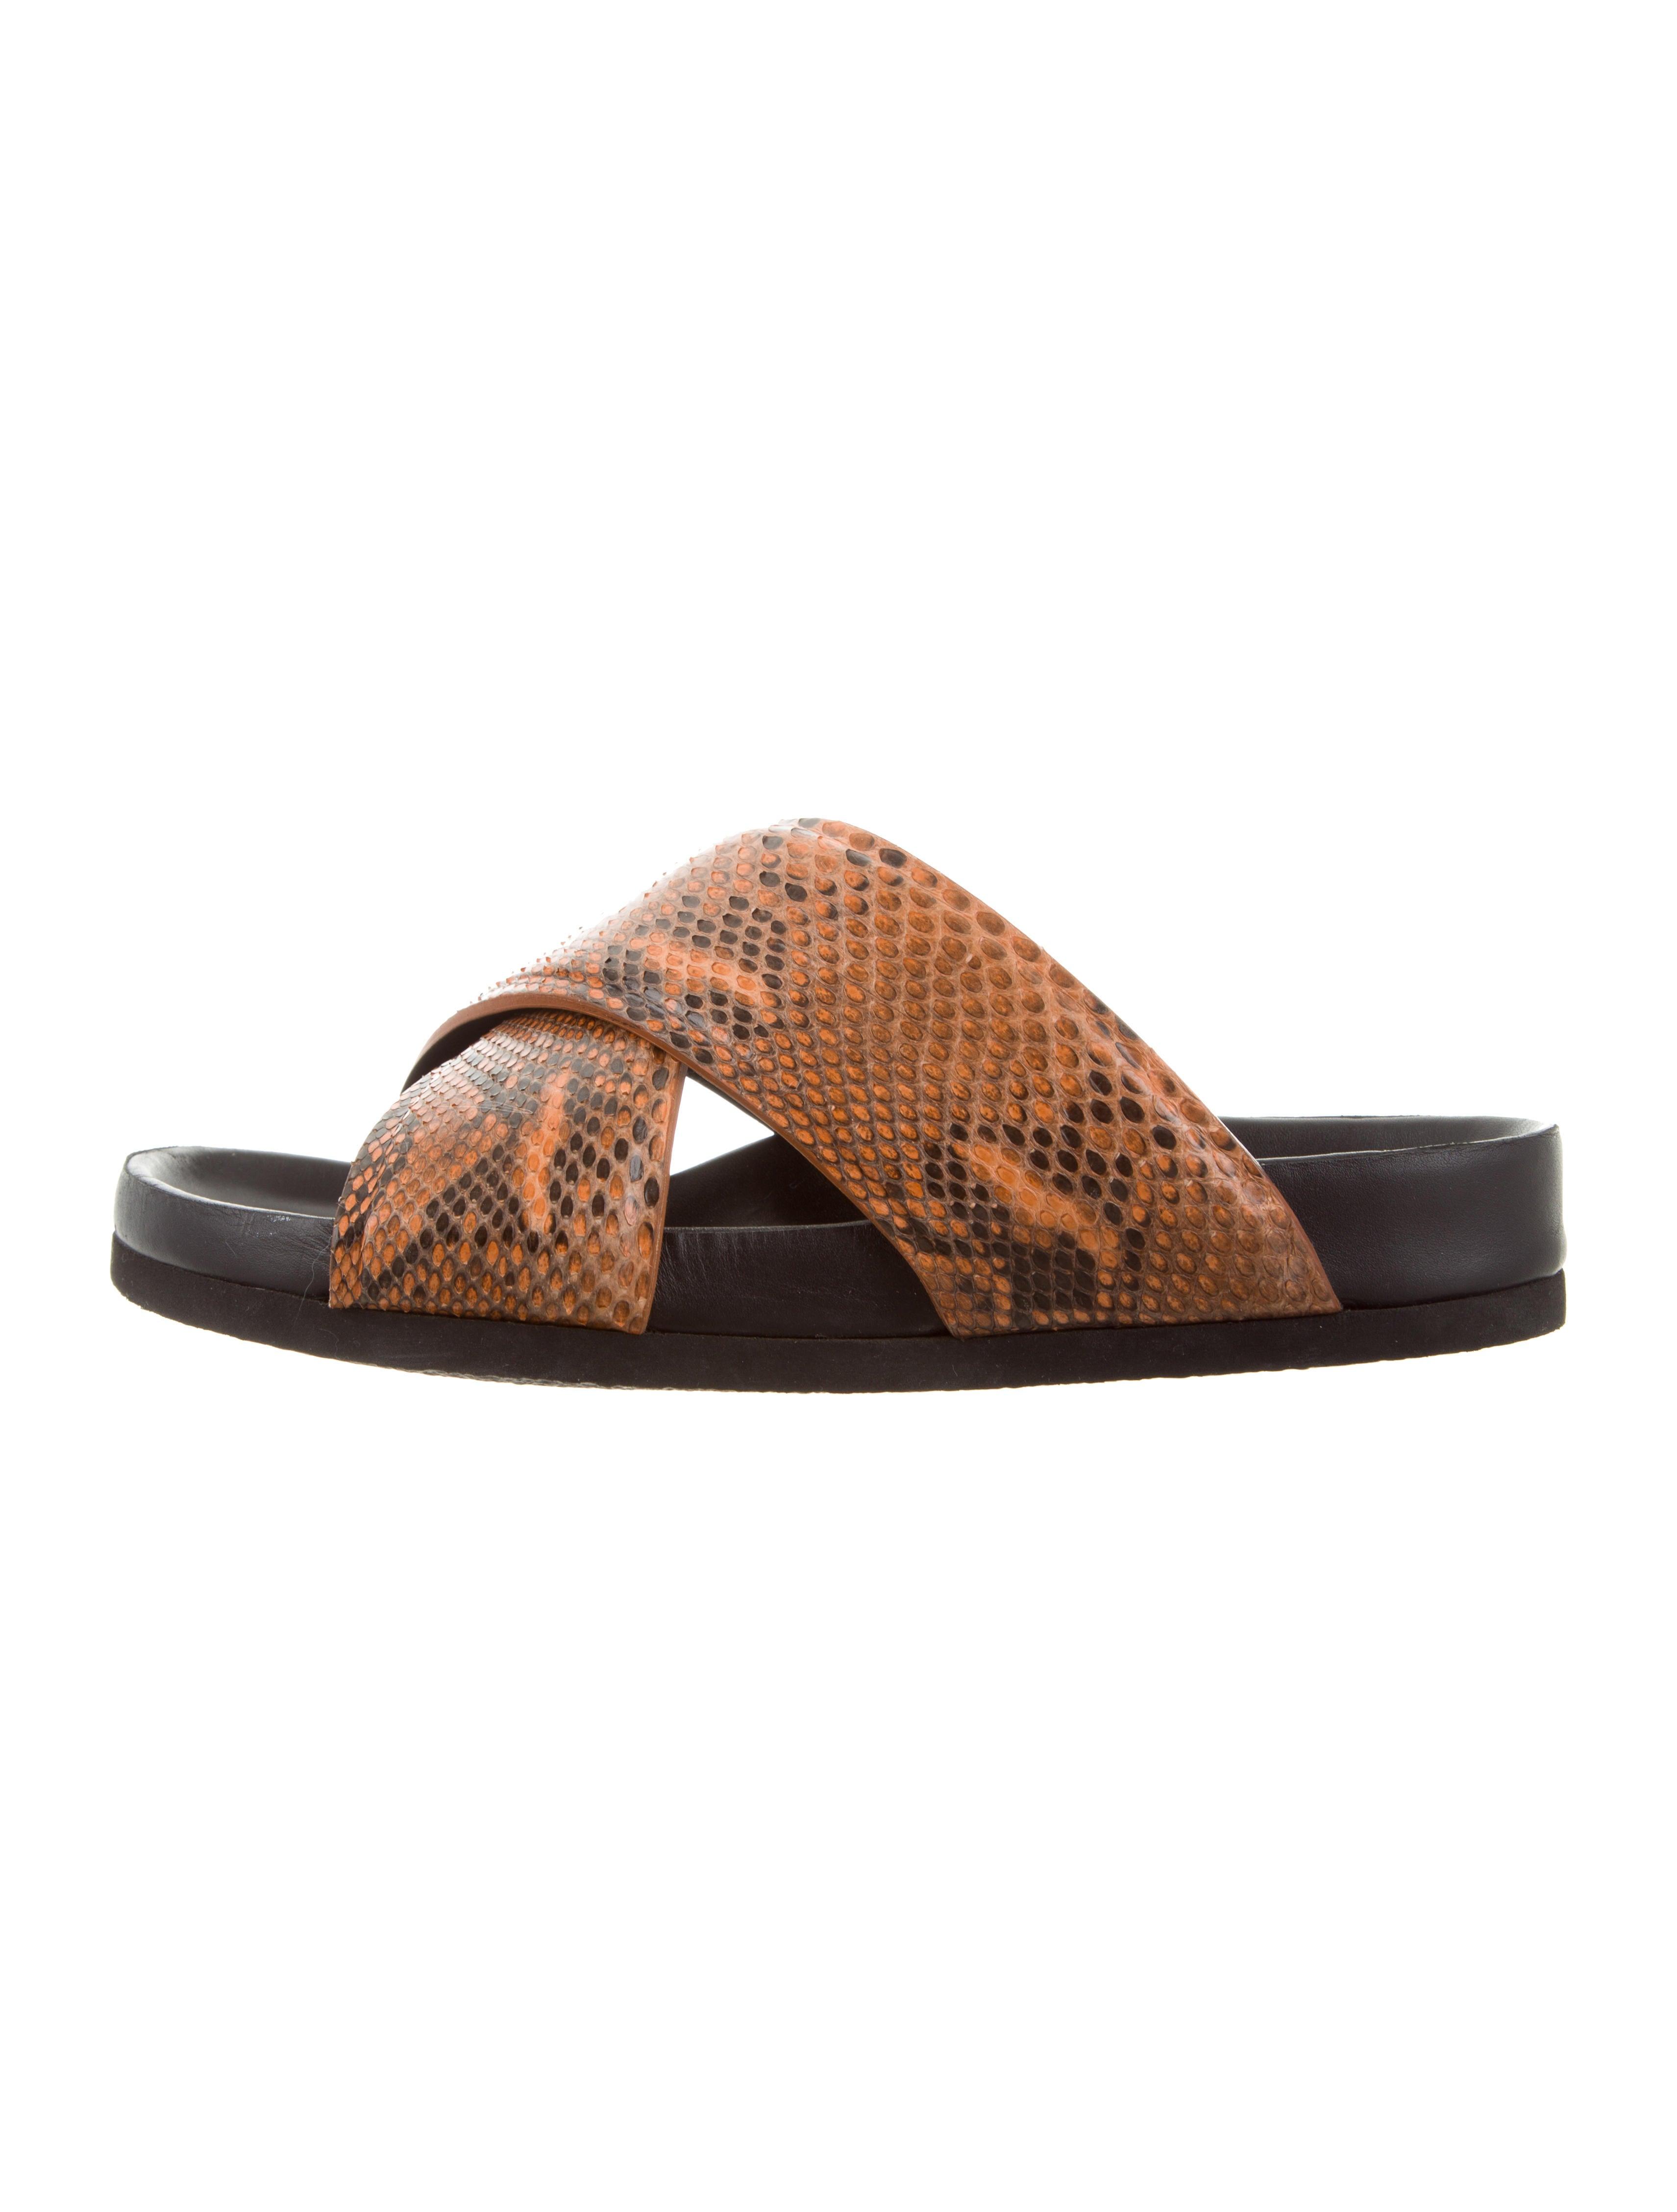 Céline Snakeskin Crossover Sandals ebay cheap price cheap sale limited edition 6CaTy4U